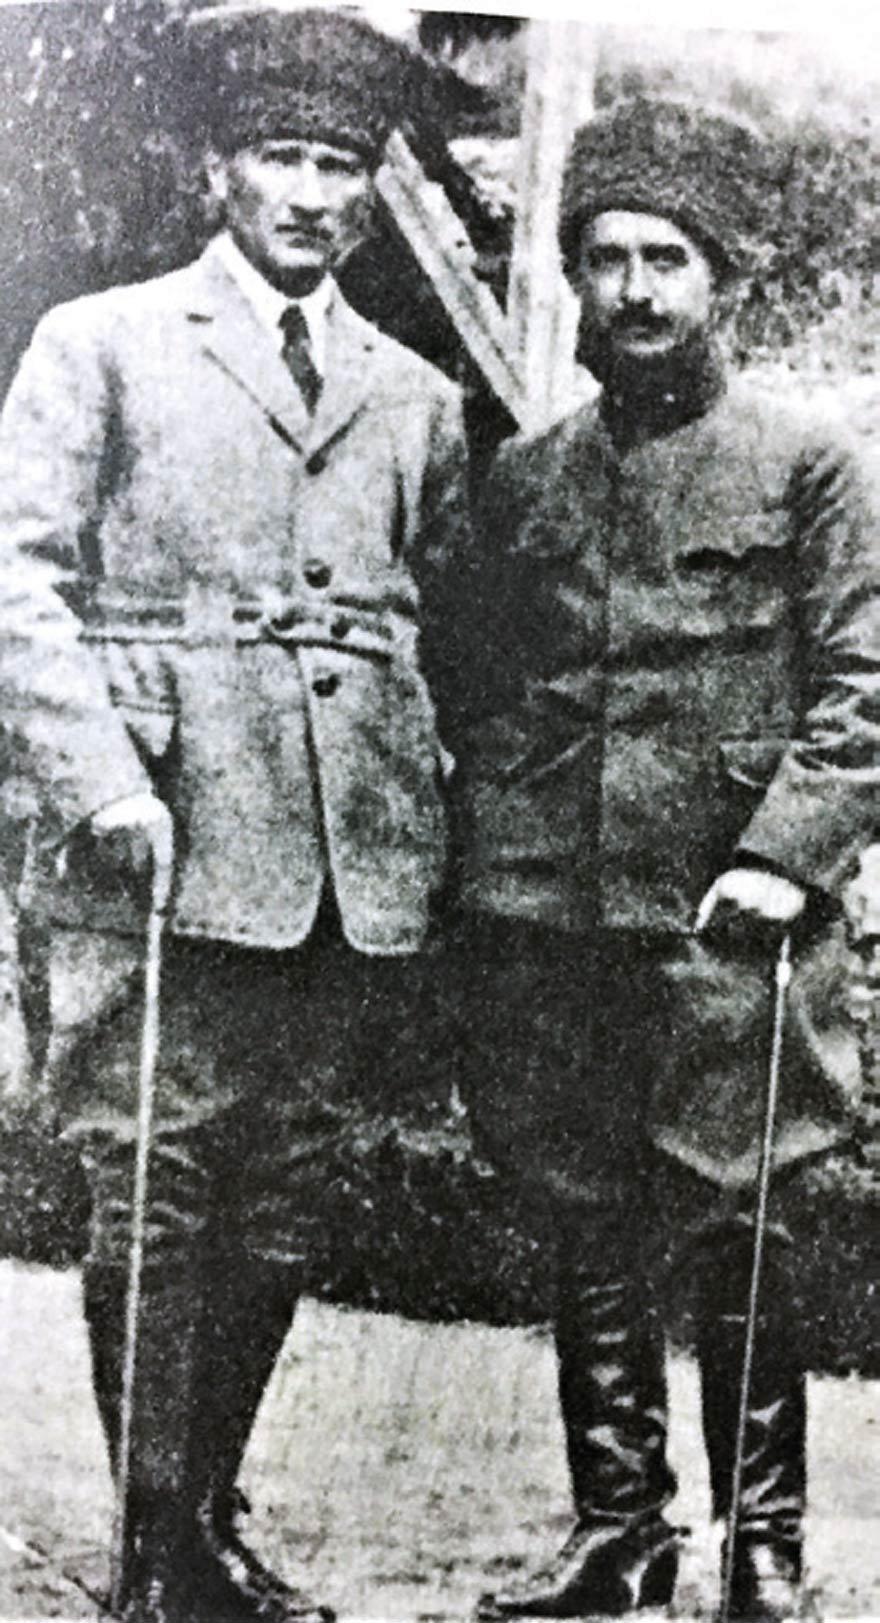 İsmet Paşa, Atatürk ile Ankara'da. (1921)